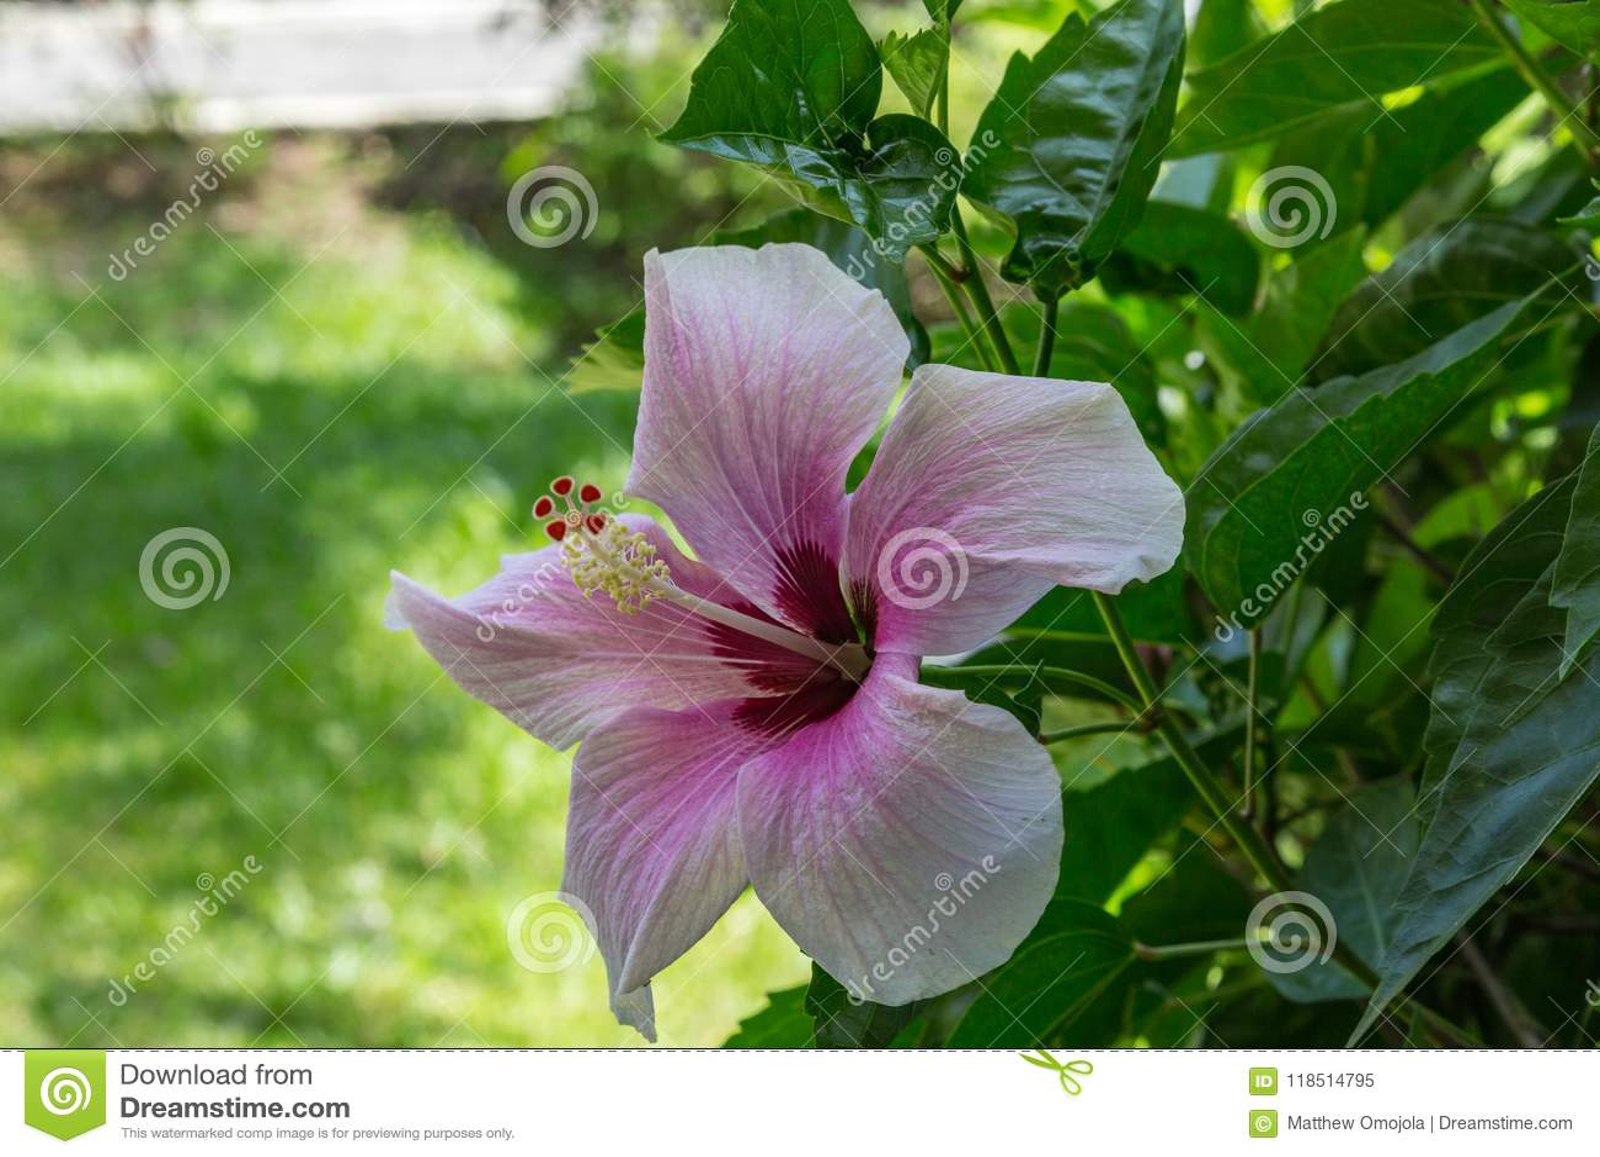 Purple hibiscus as seen in montego bay lucea jamaica stock image download purple hibiscus as seen in montego bay lucea jamaica stock image image of caribbean izmirmasajfo